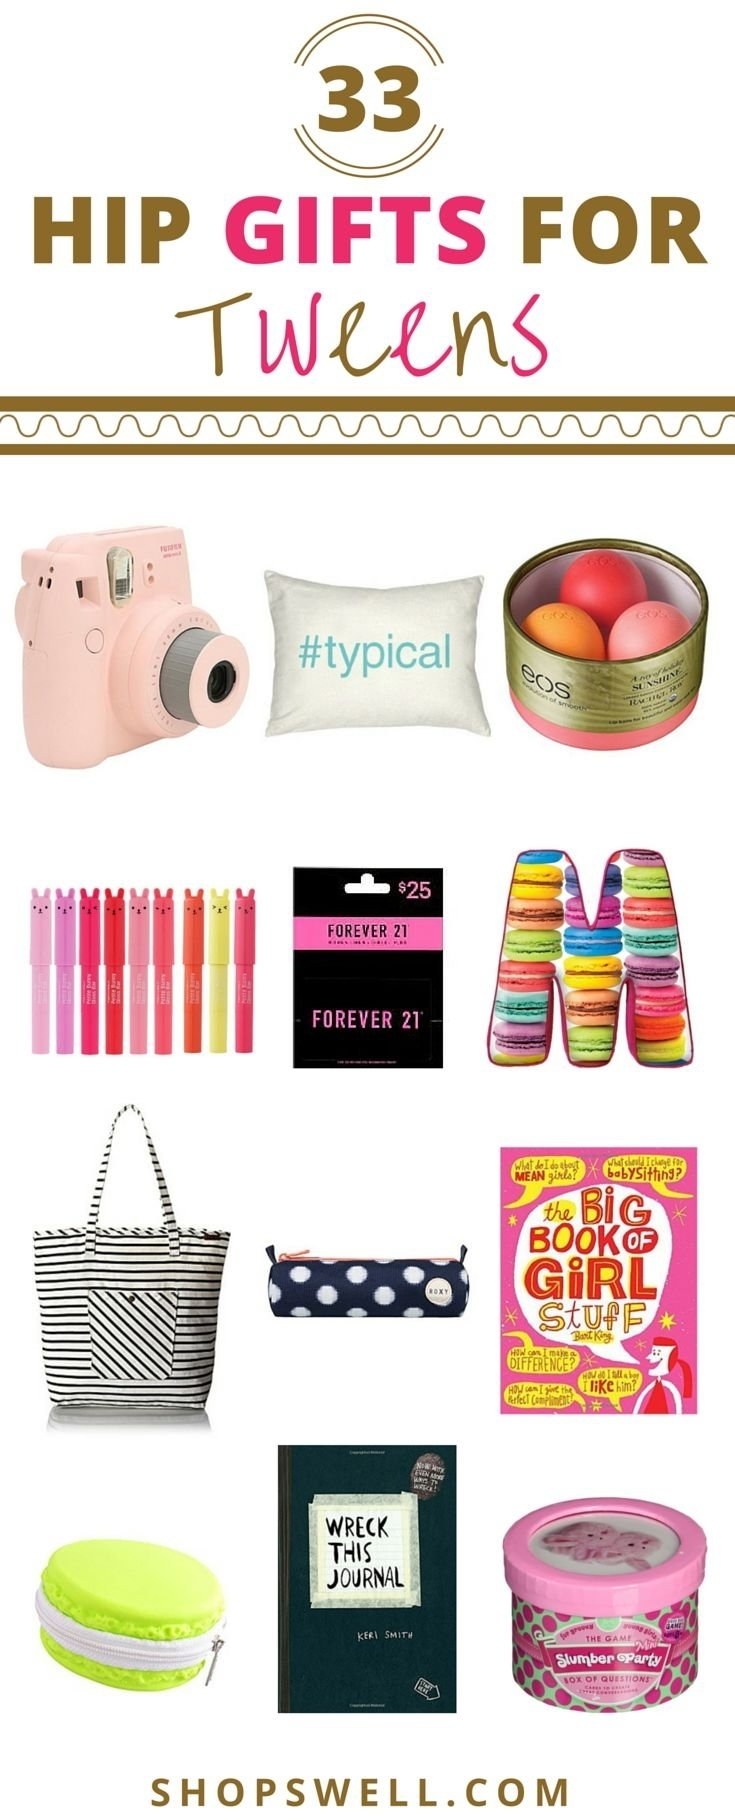 10 Attractive Tween Gift Ideas For Girls 380 best tweens and teens images on pinterest baby books beds 2020